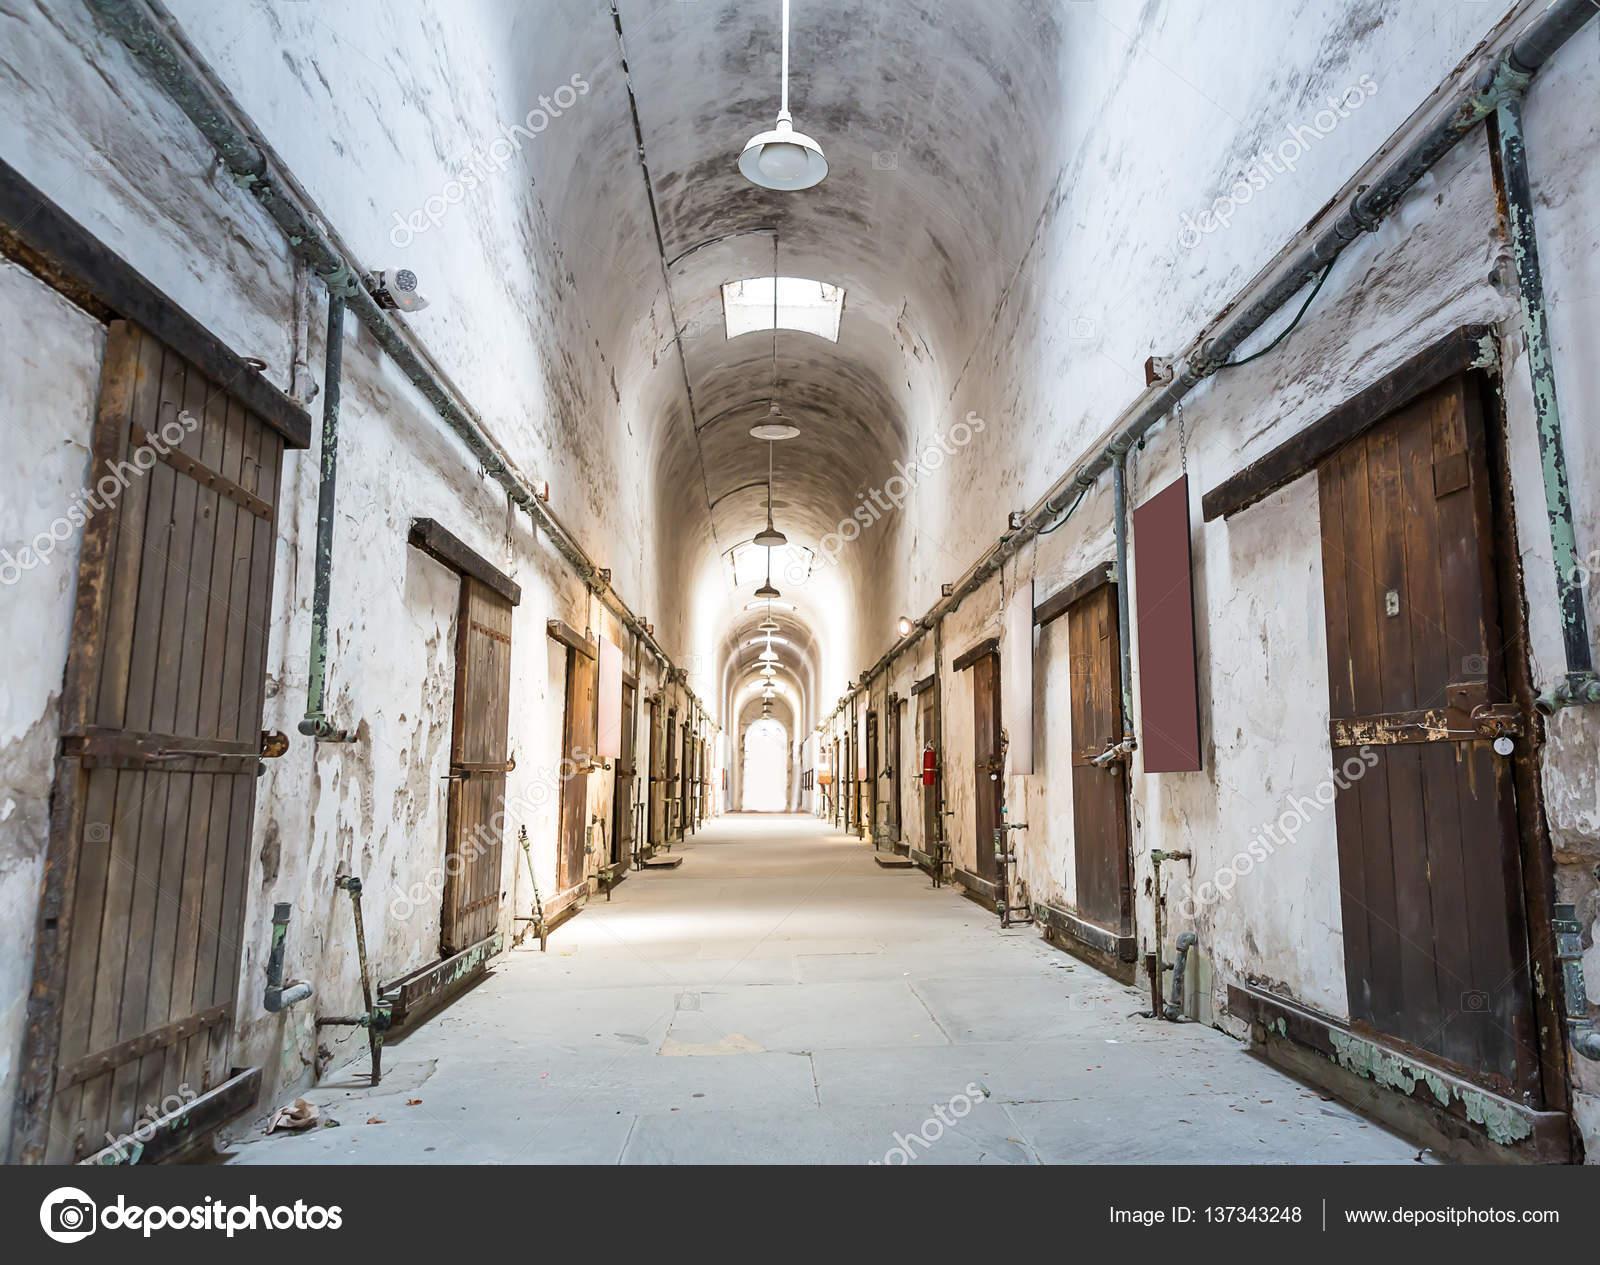 old prison interior — Stock Photo © Nomadsoul1 #137343248